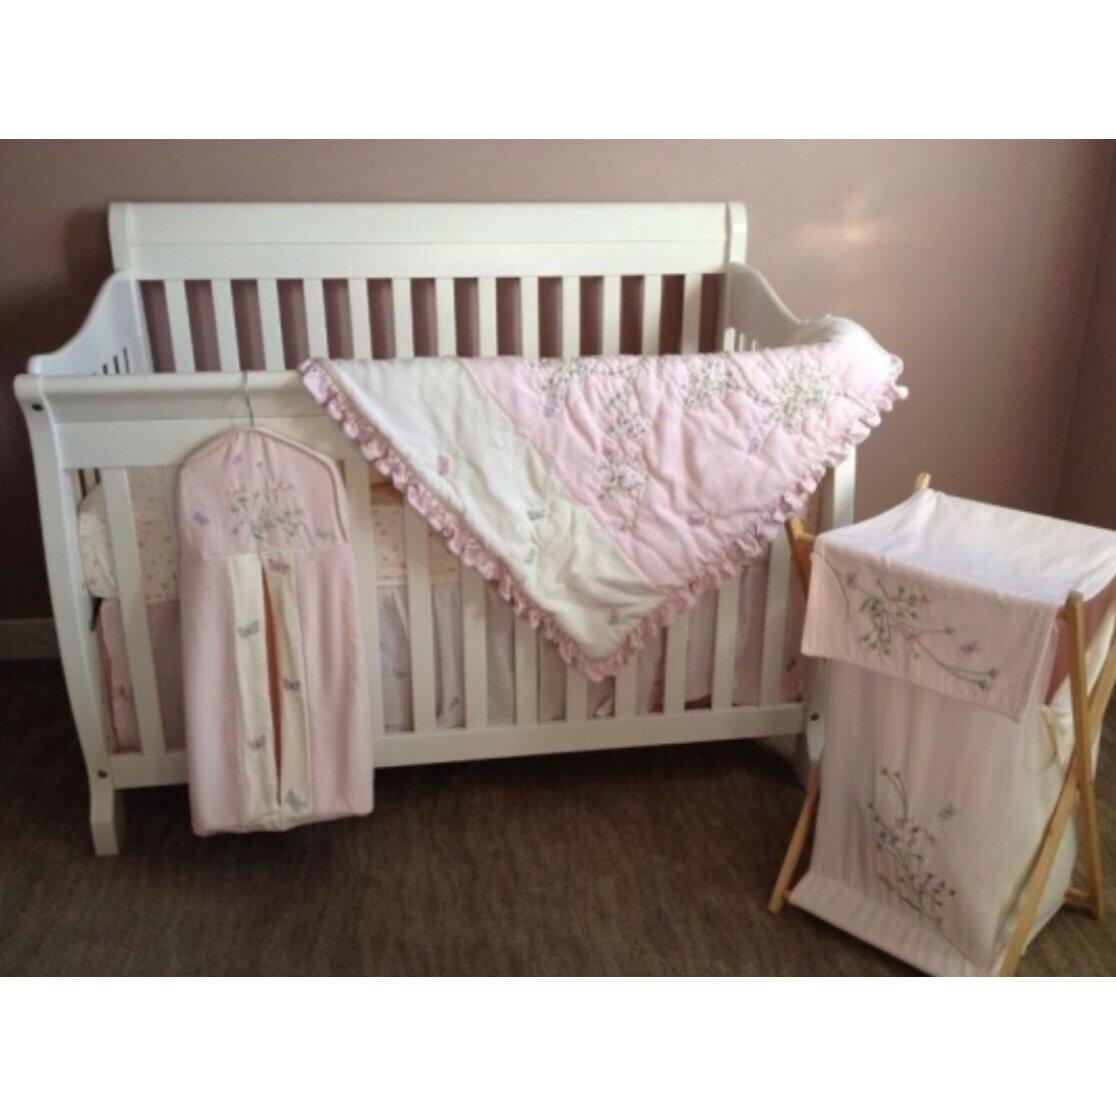 Crib for sale victoria bc - Concord Baby Lisa 4 In 1 Convertible Crib